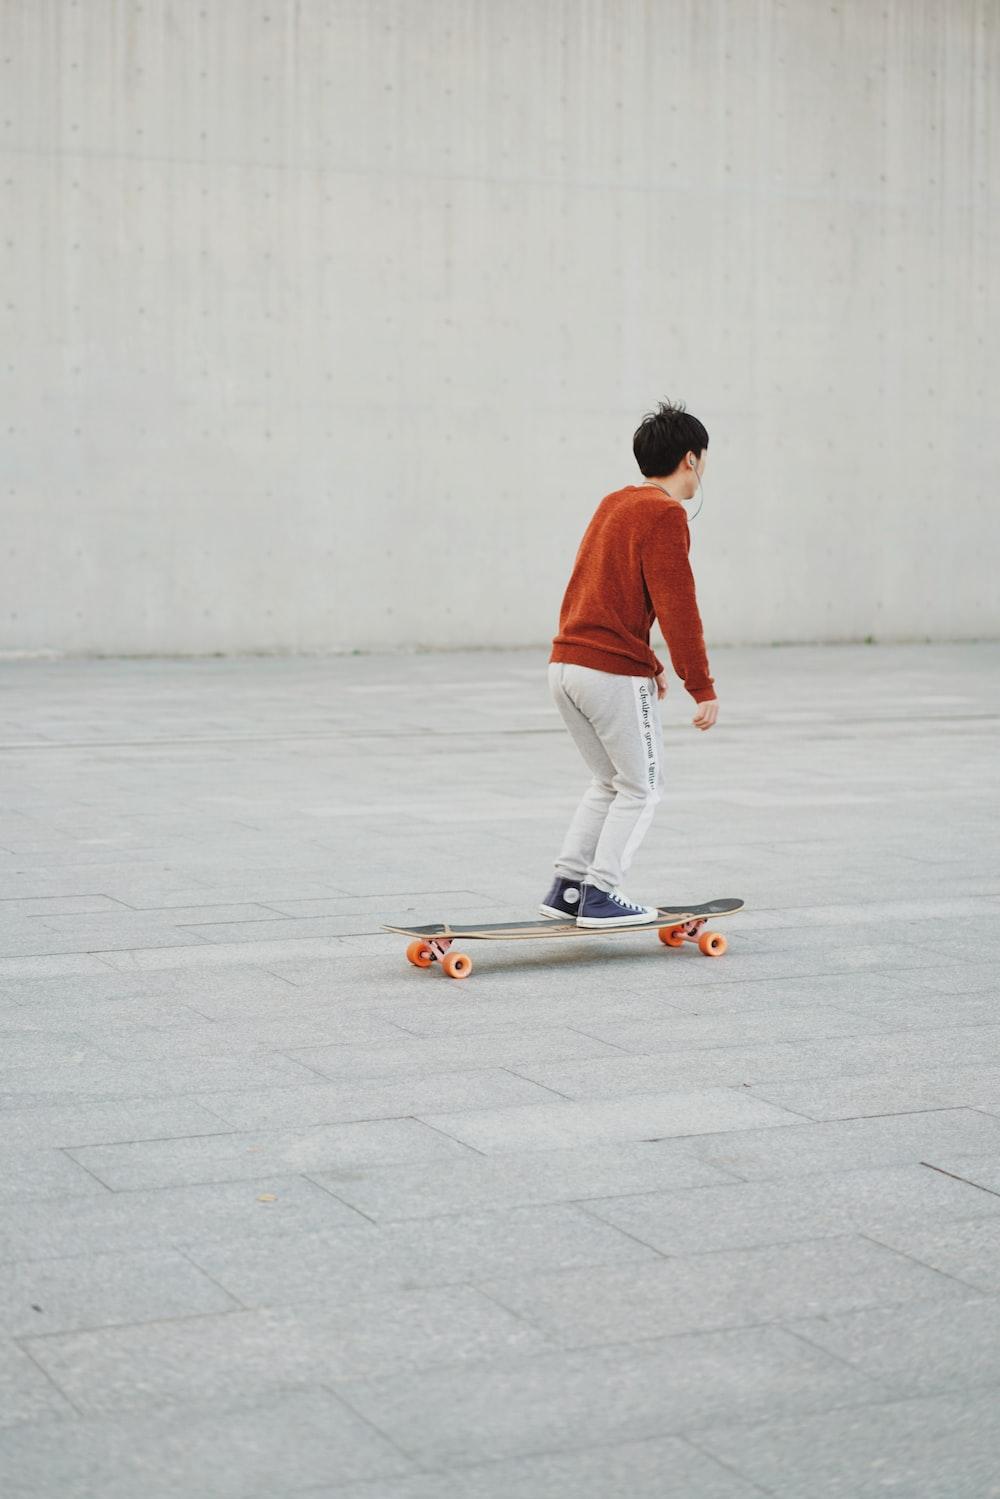 man skating on pavement